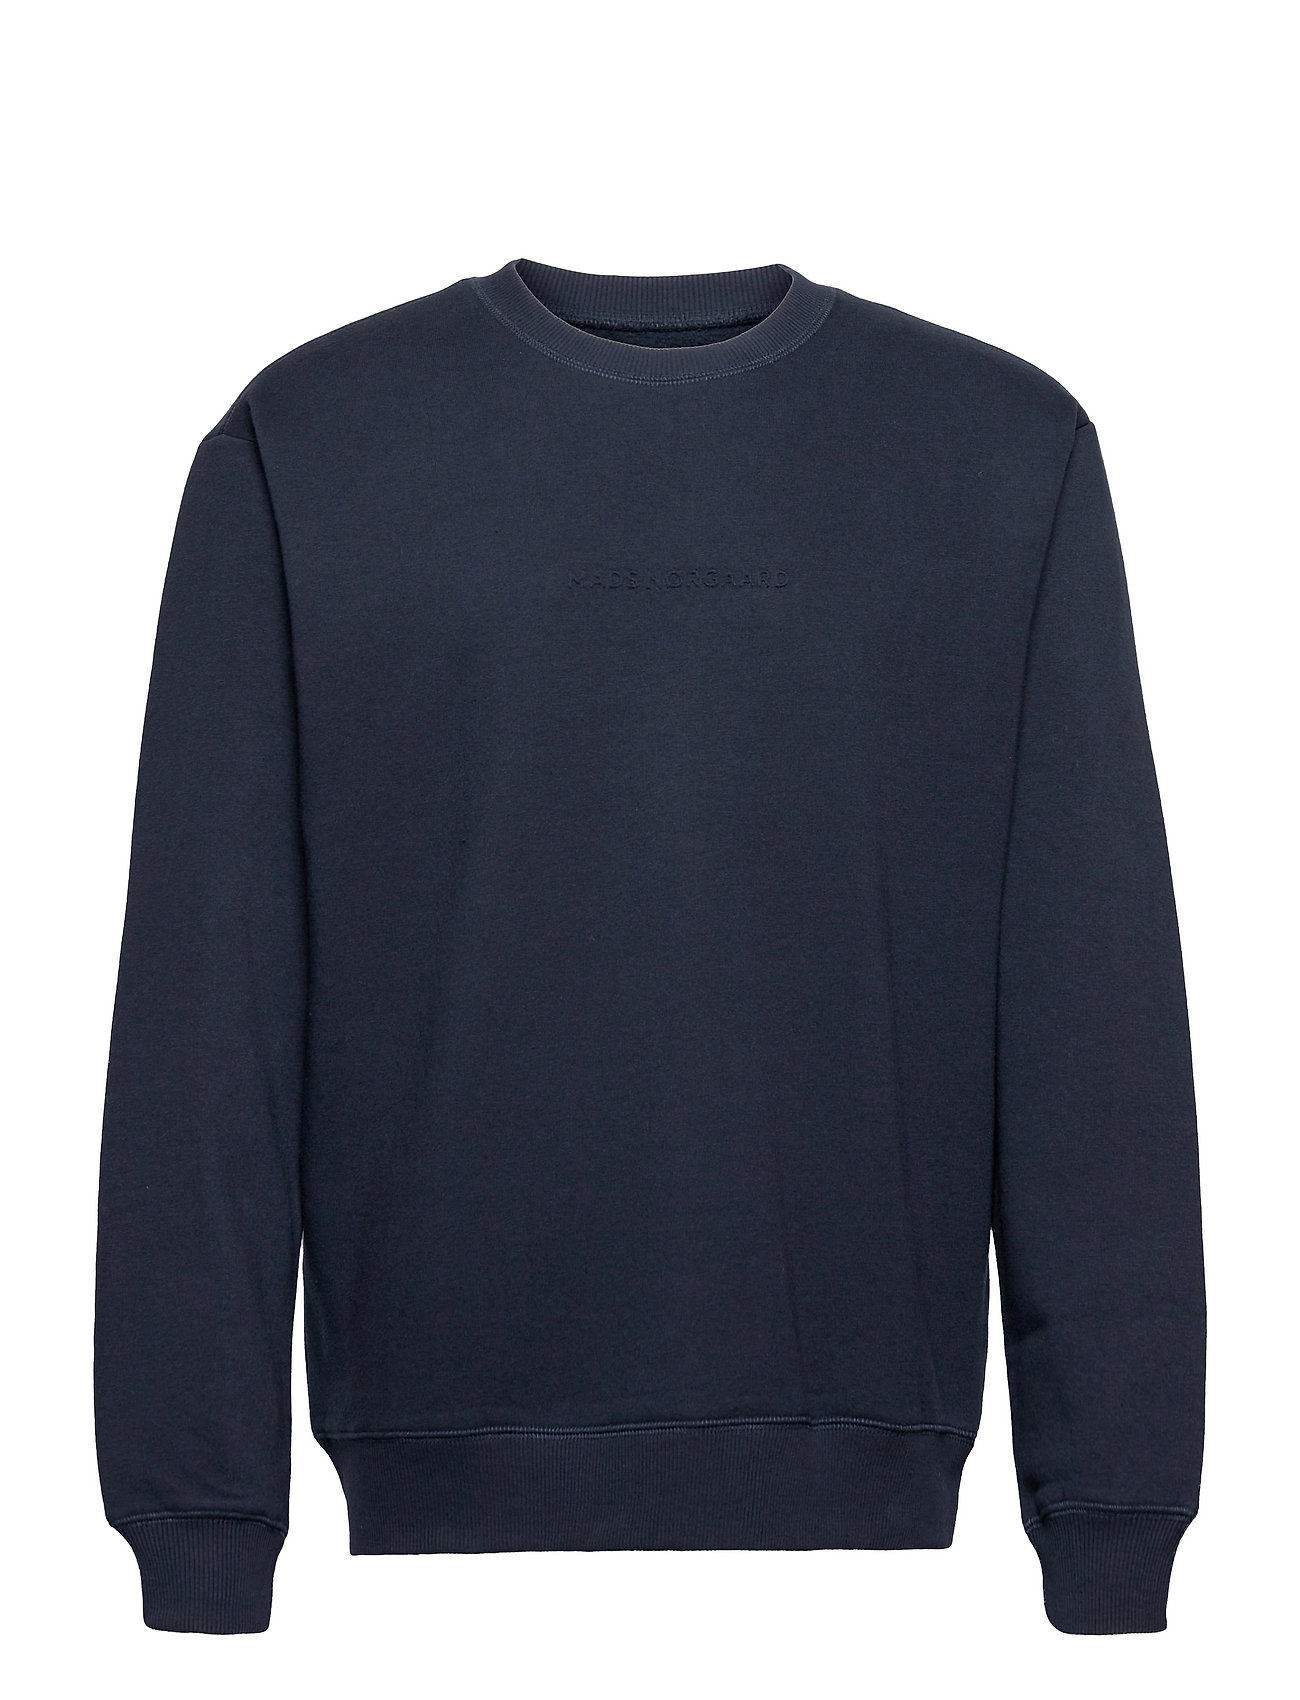 New Standard Embo Crew Sweatshirt Trøje Blå Mads Nørgaard